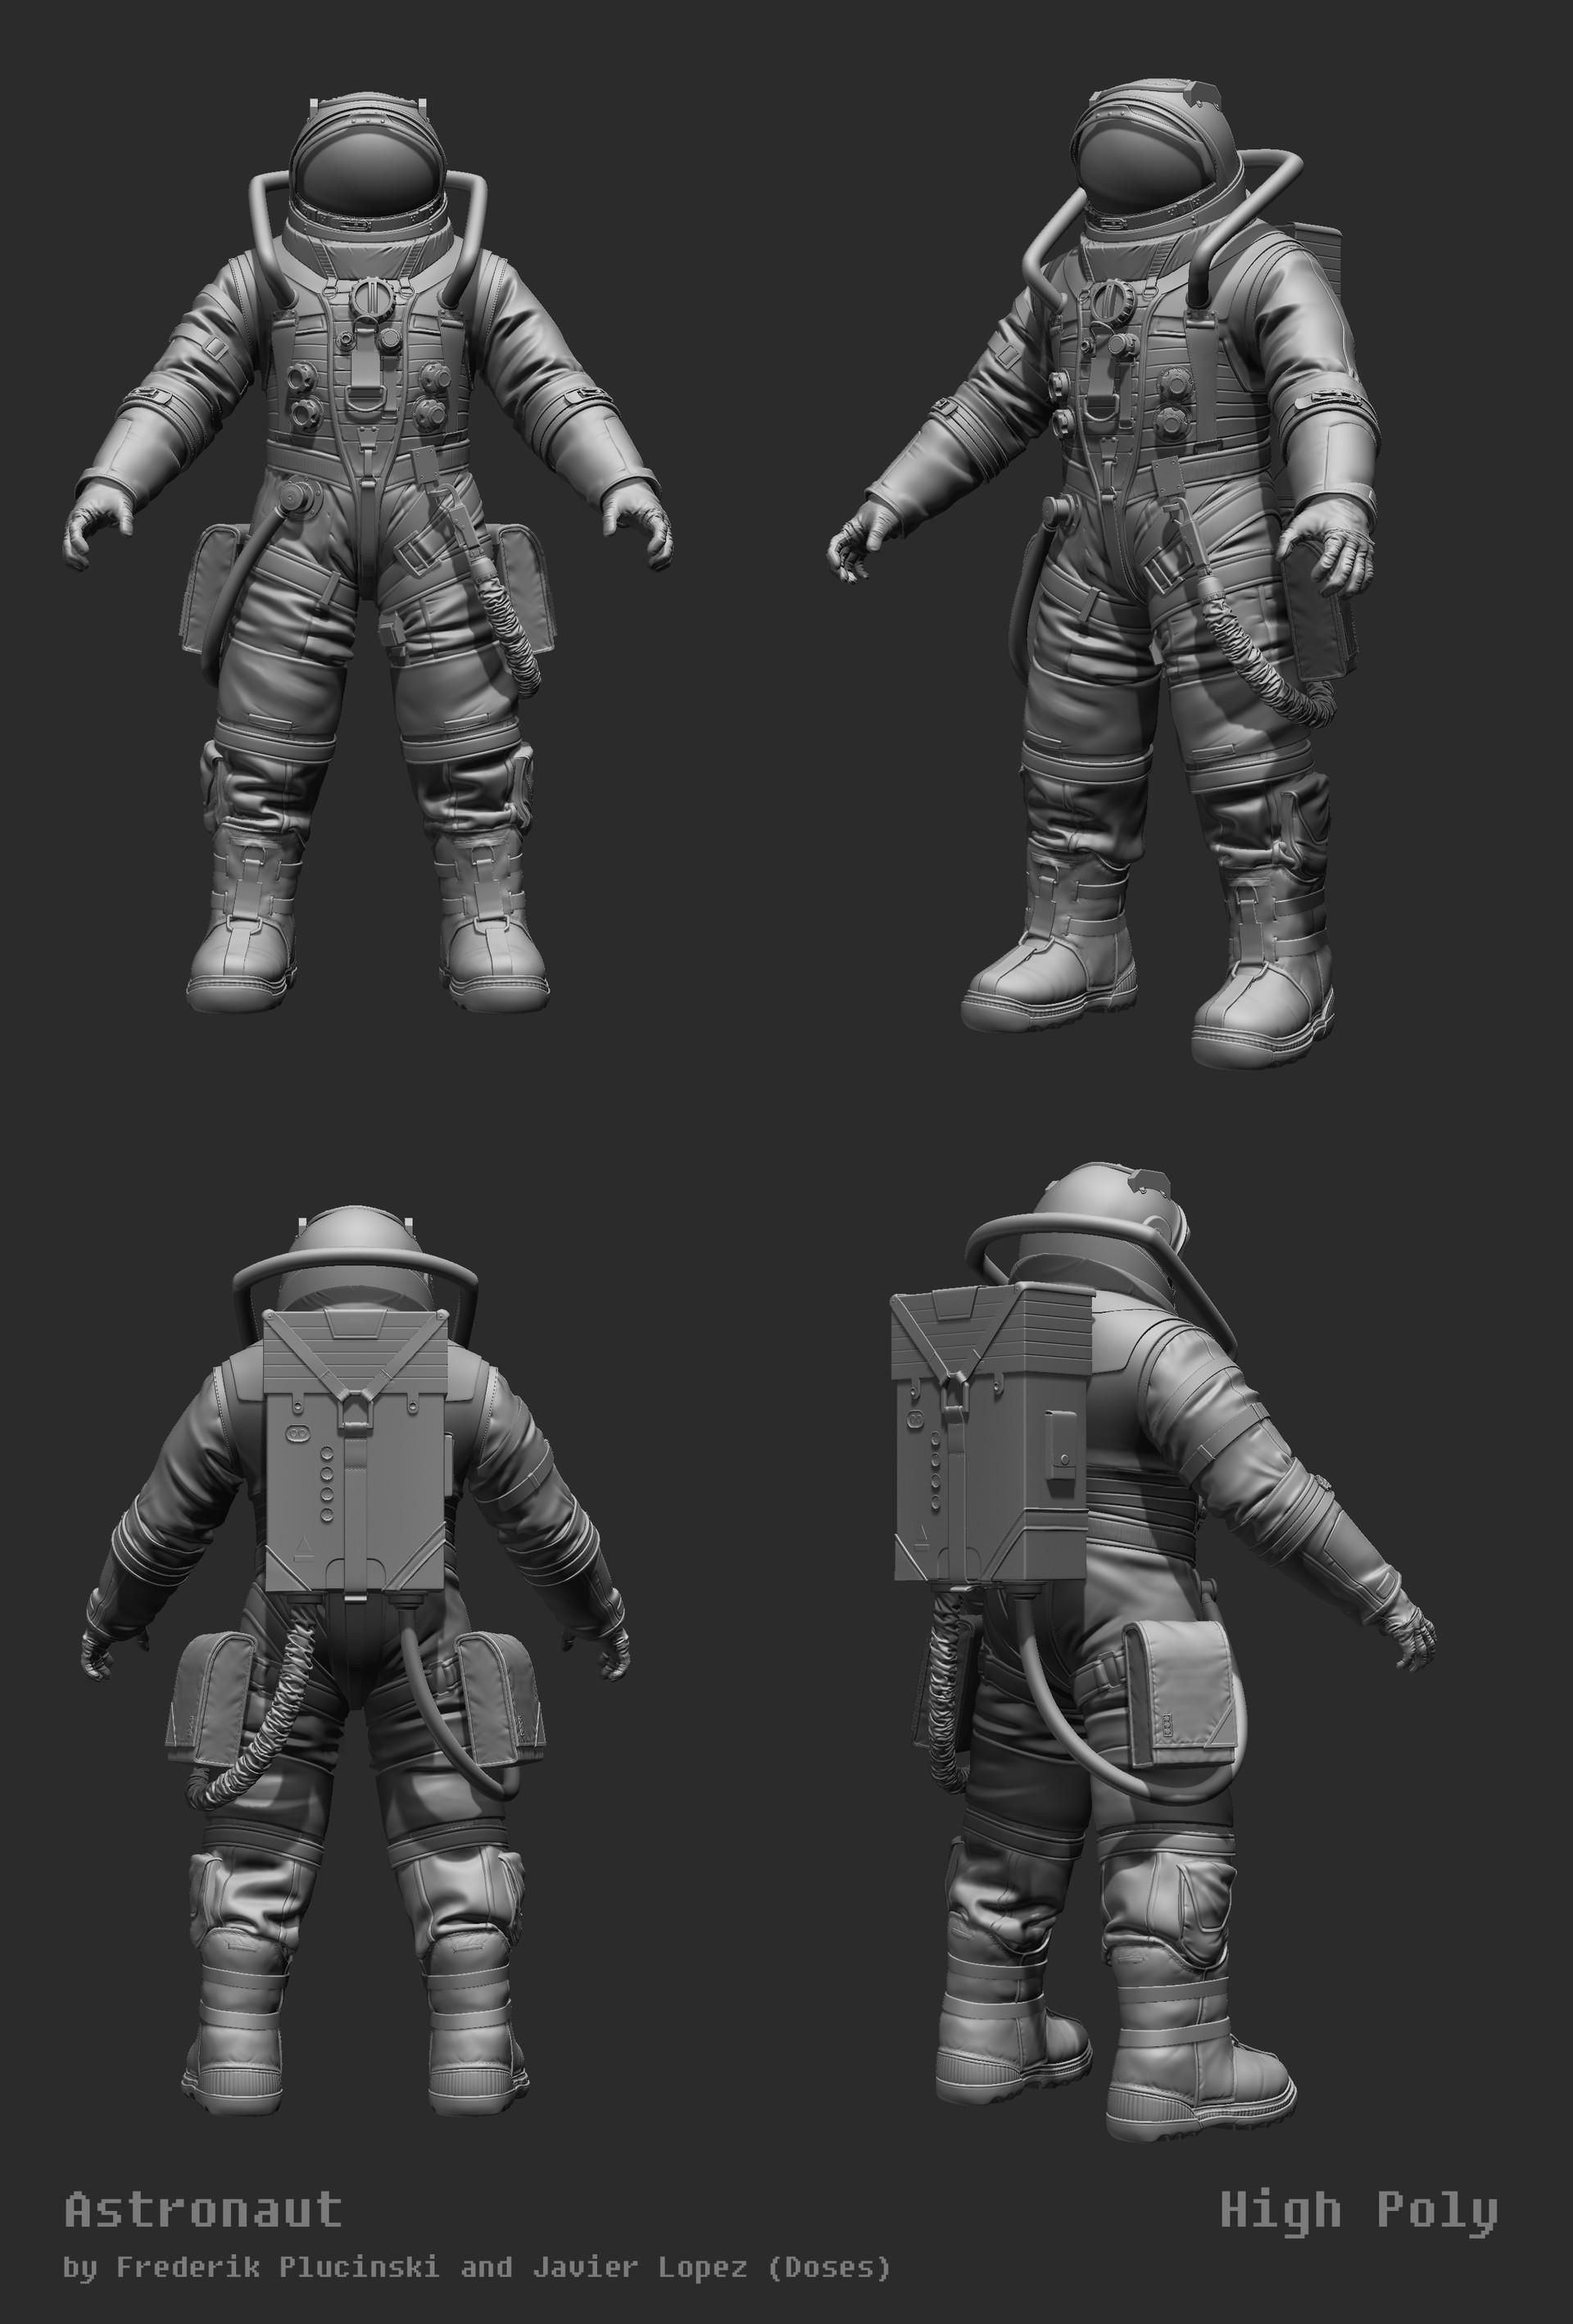 Frederik a plucinski astronaut high